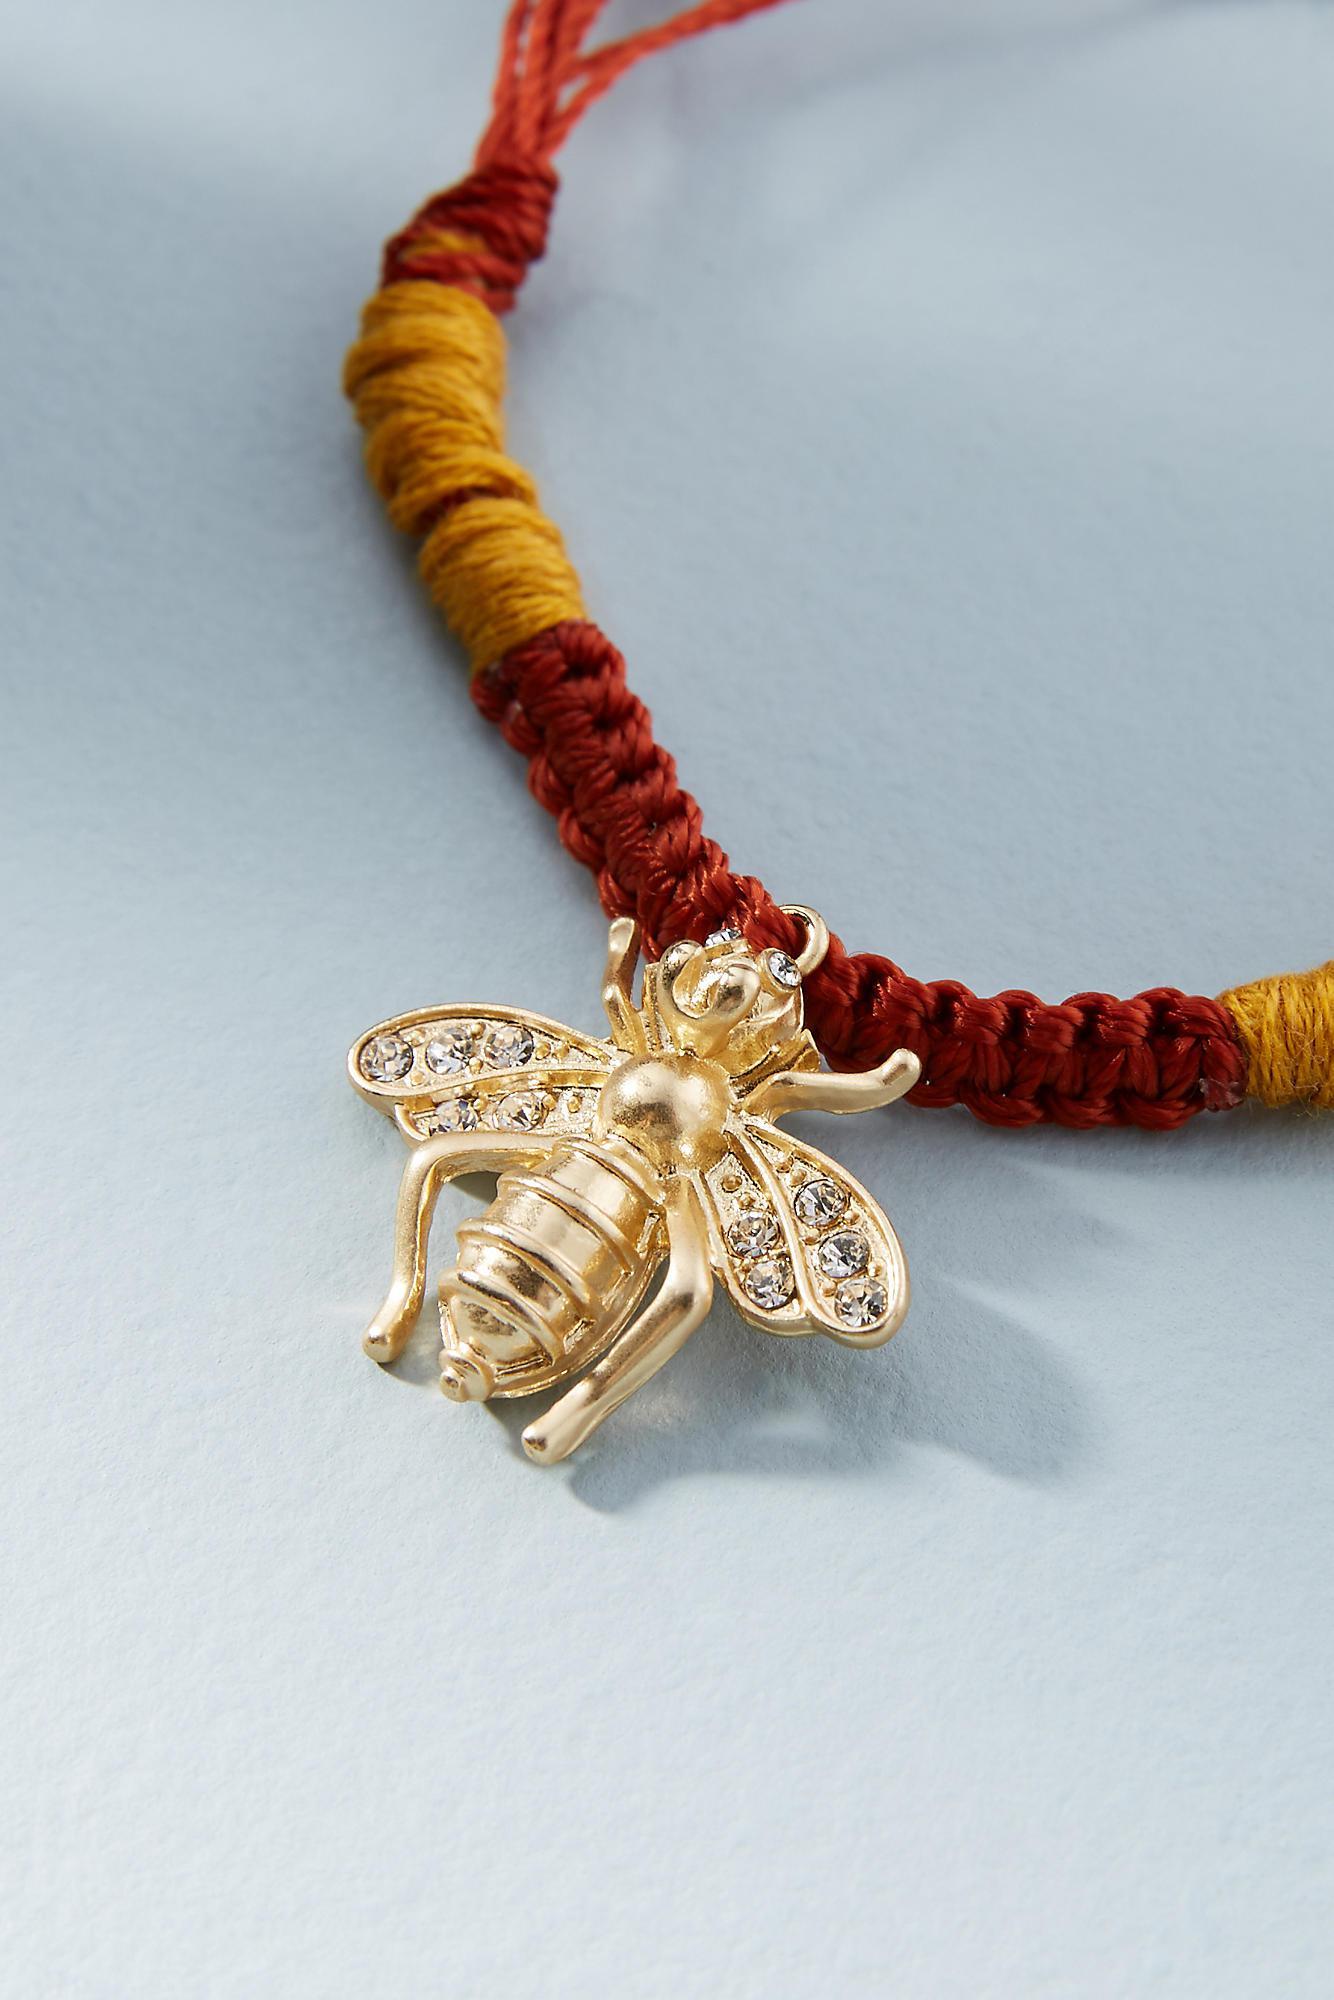 Anthropologie Woven Charm Bracelet XUm5Acx